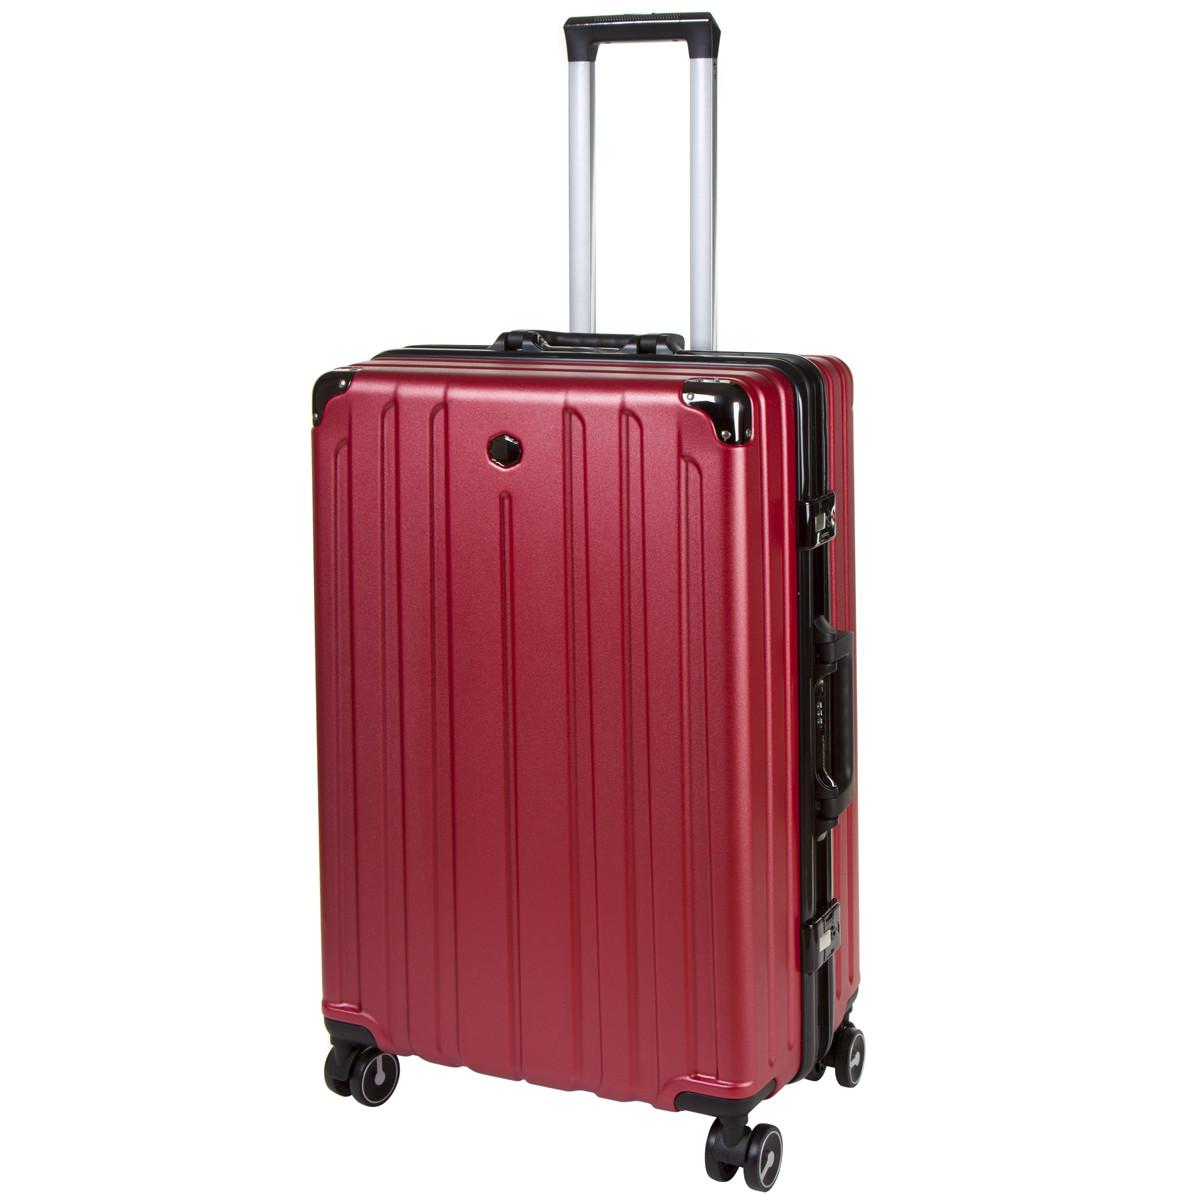 Чемодан большой бордовый OUPAI 46х72х29 пластик ABS алюминиевый каркас  кс1106-1борб